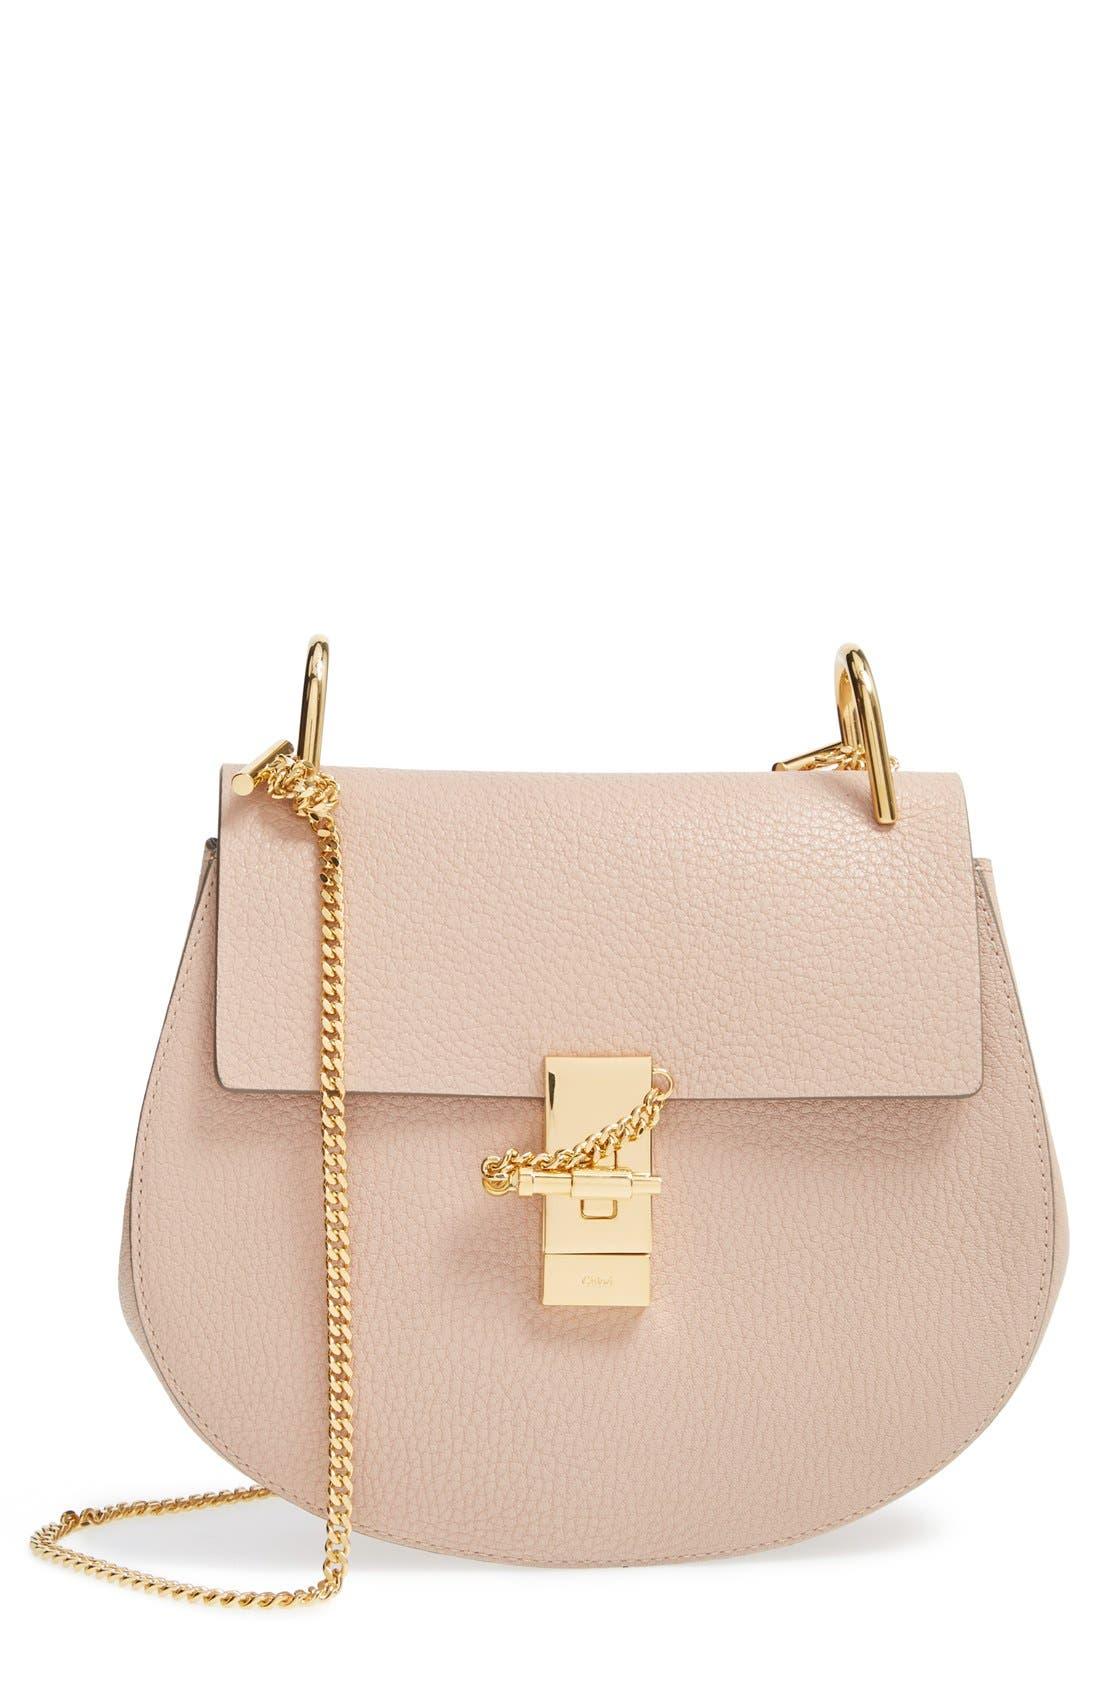 CHLOÉ Drew Leather Shoulder Bag, Main, color, 650